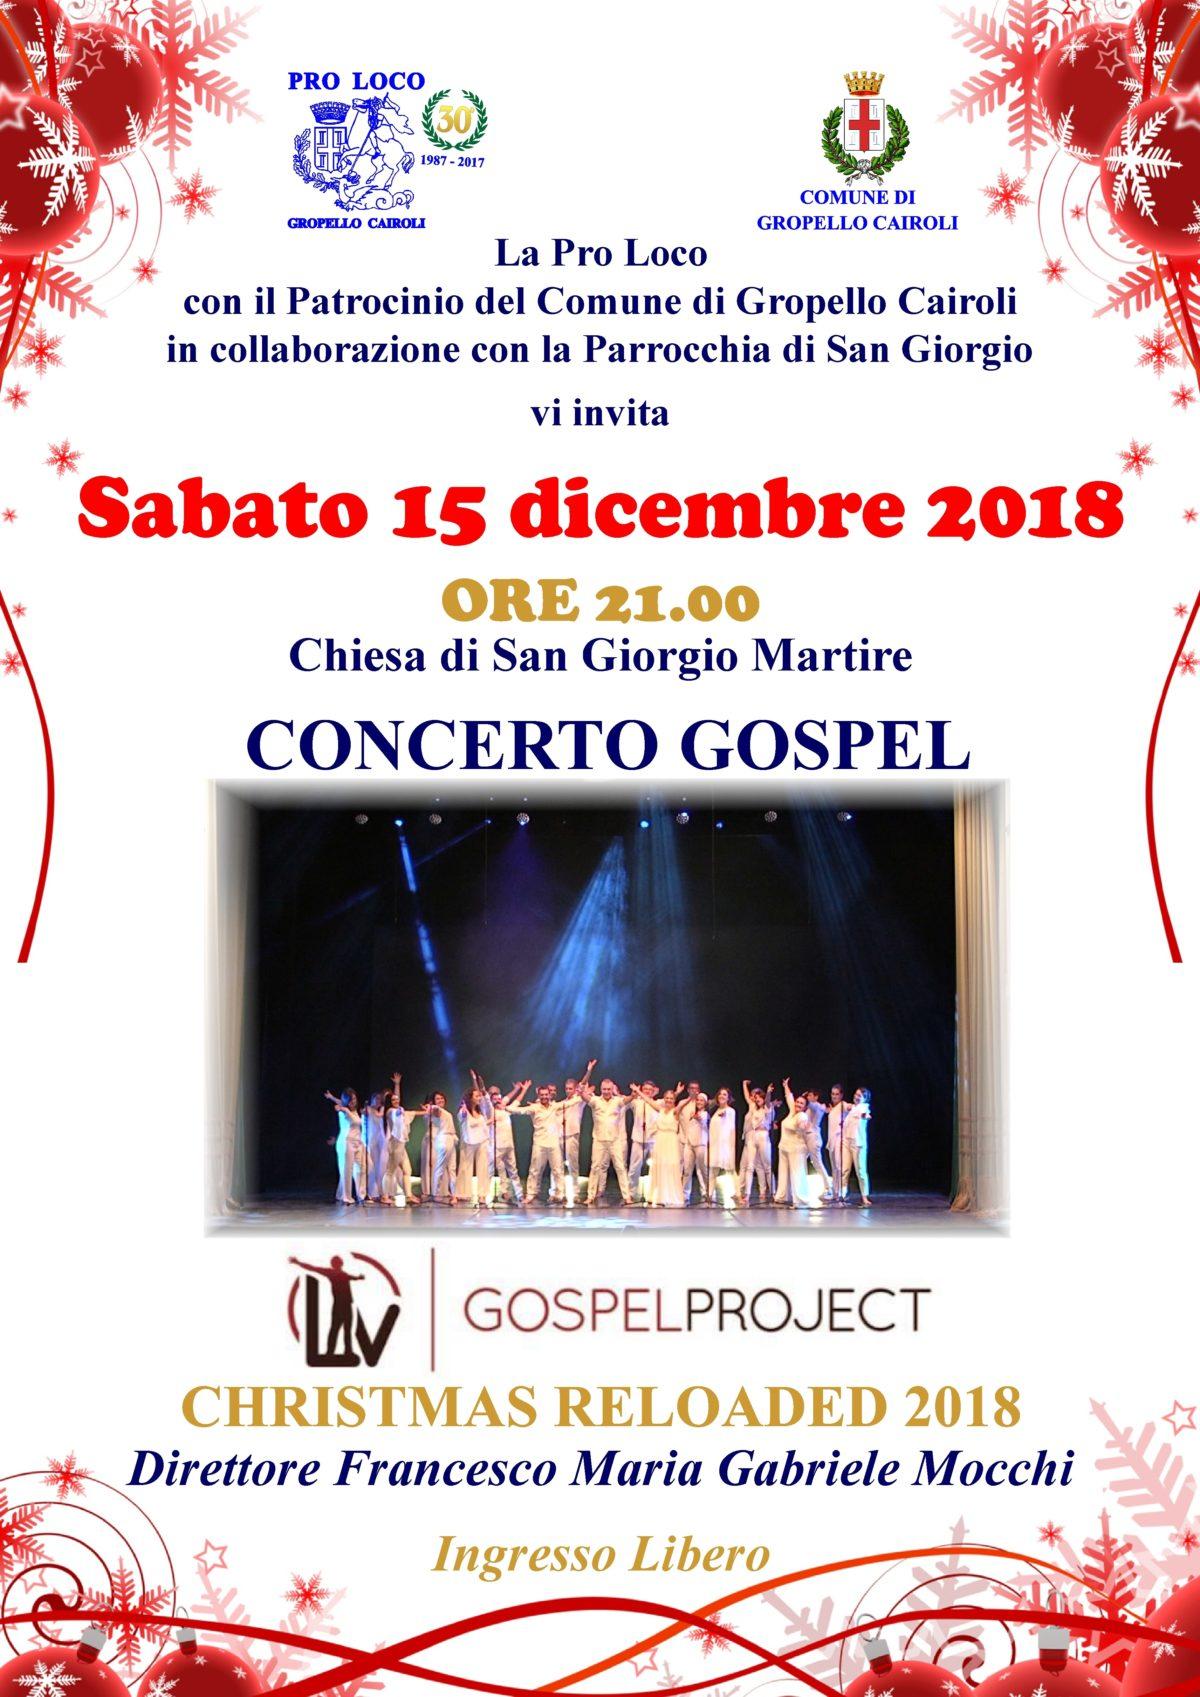 Sabato 15 dicembre Concerto Gospel